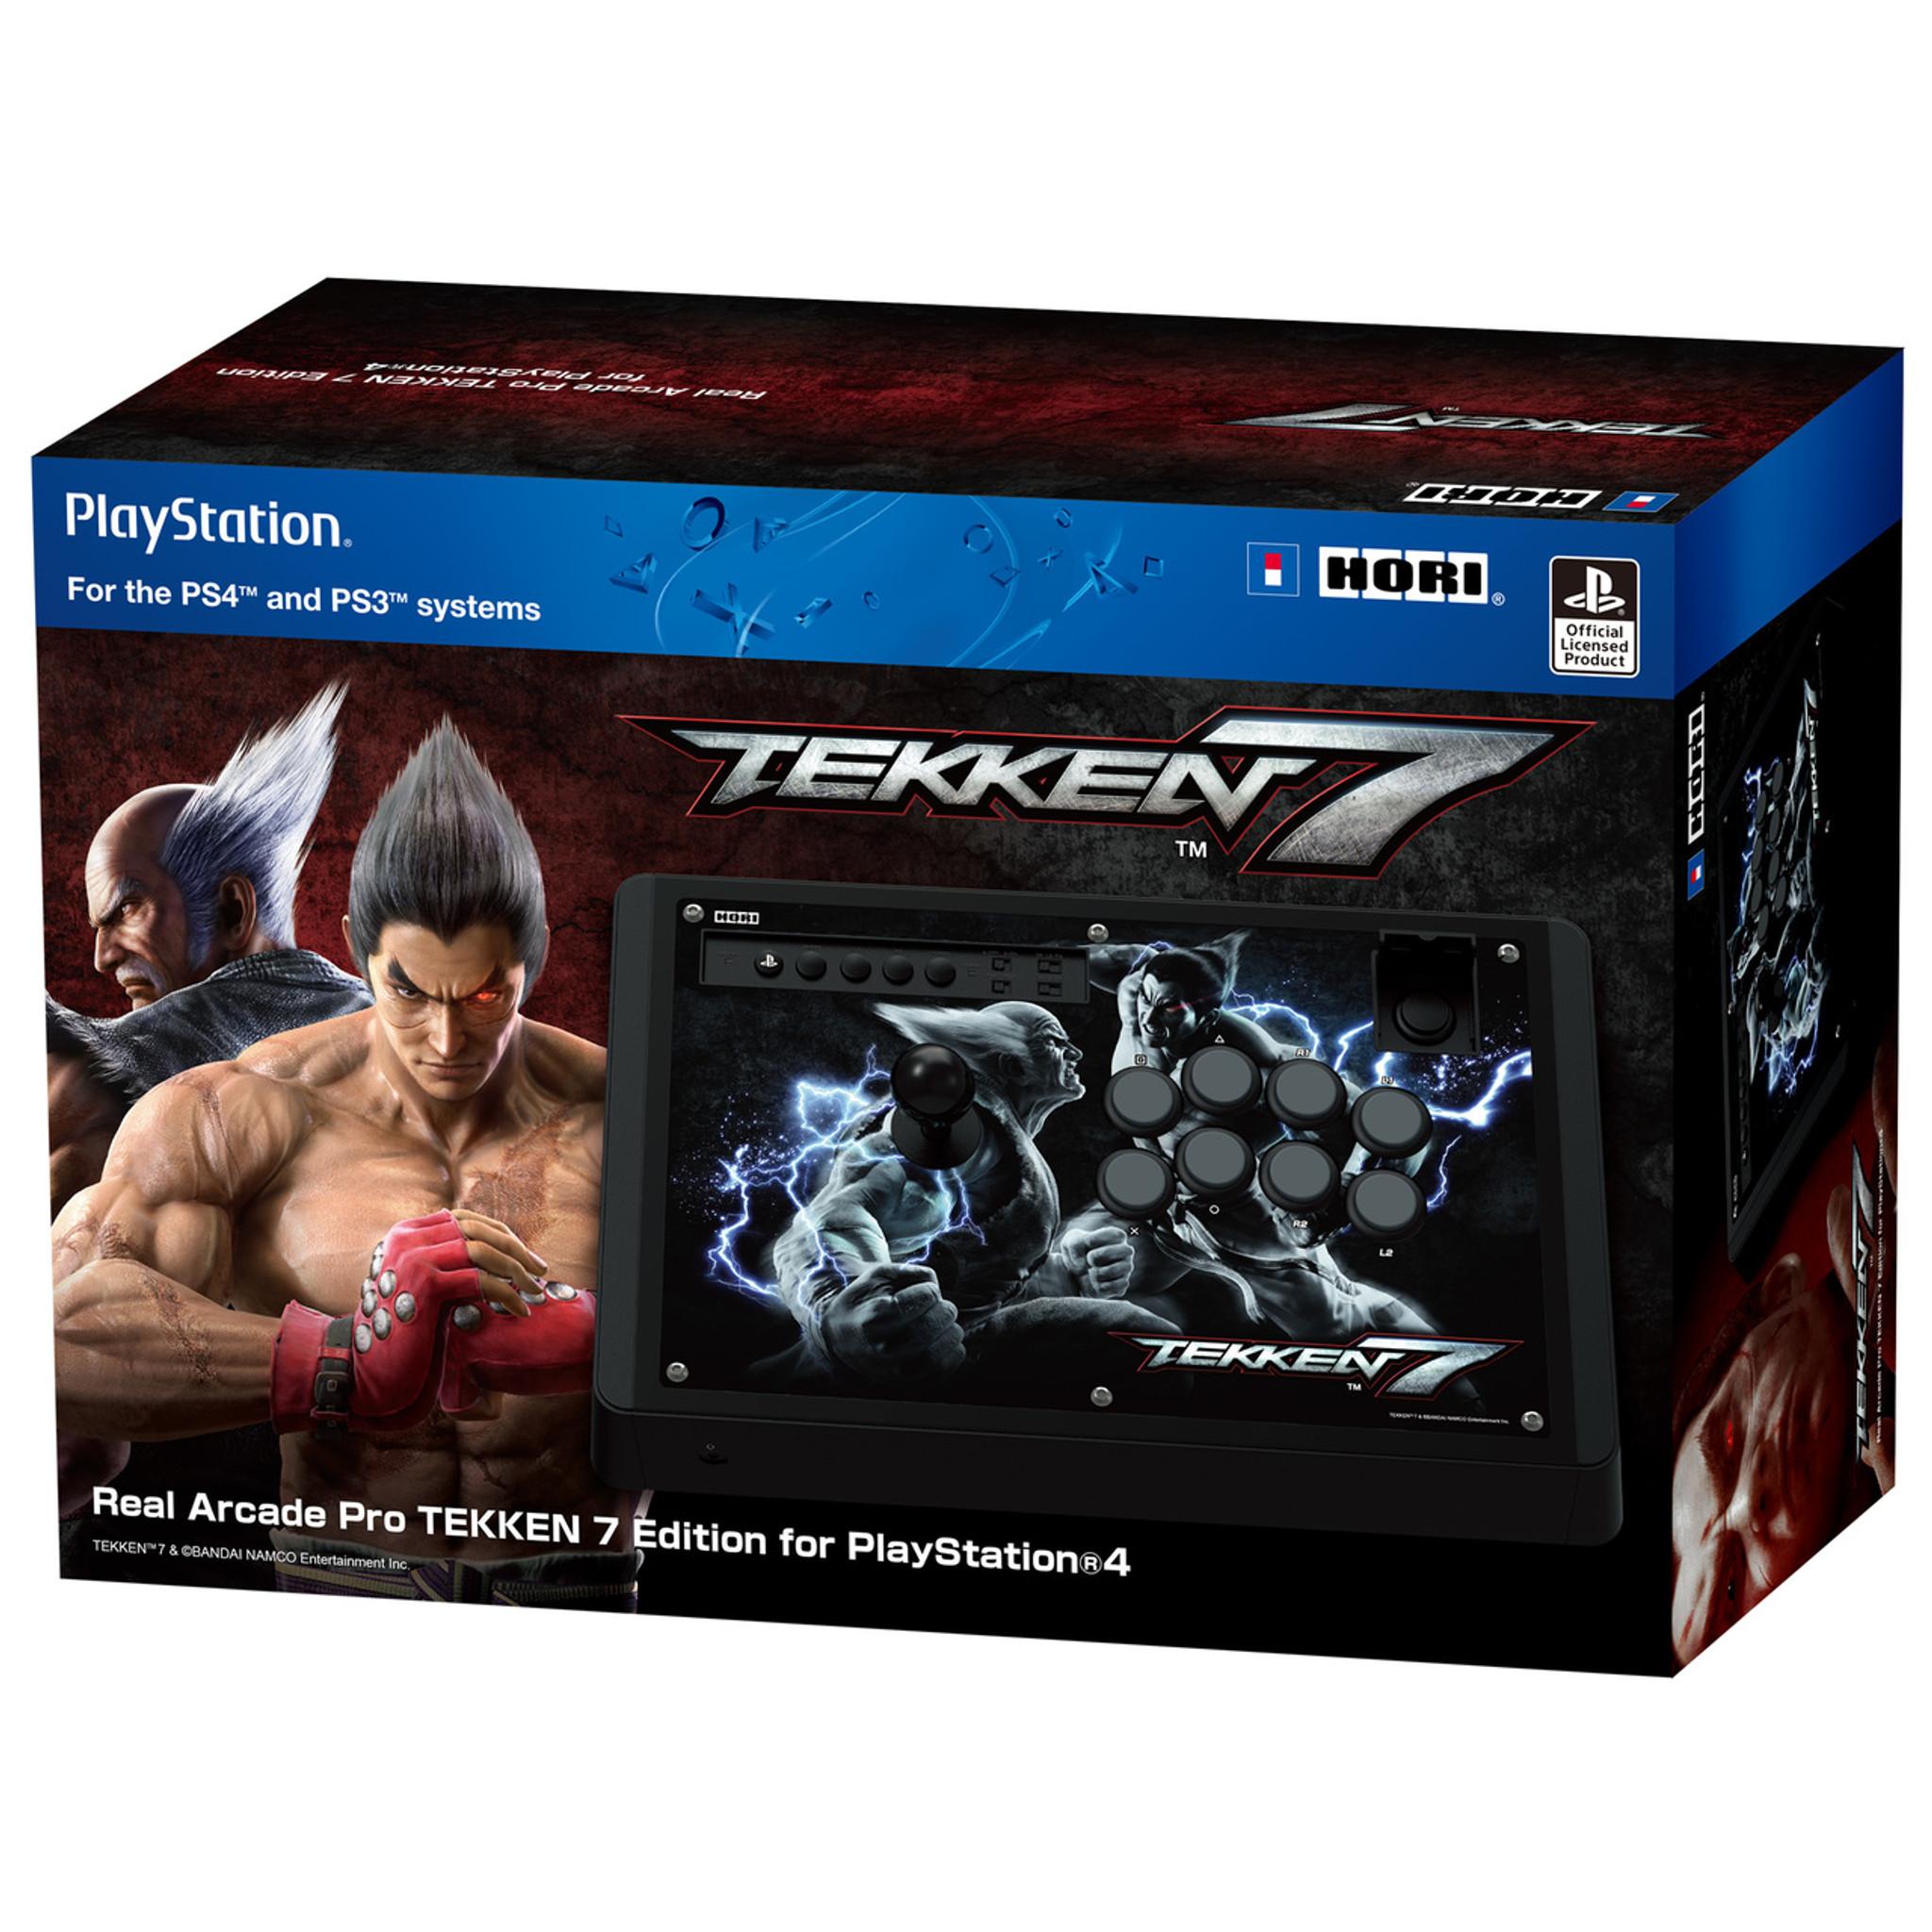 Real Arcade Pro Tekken 7 Edition for PlayStation 4